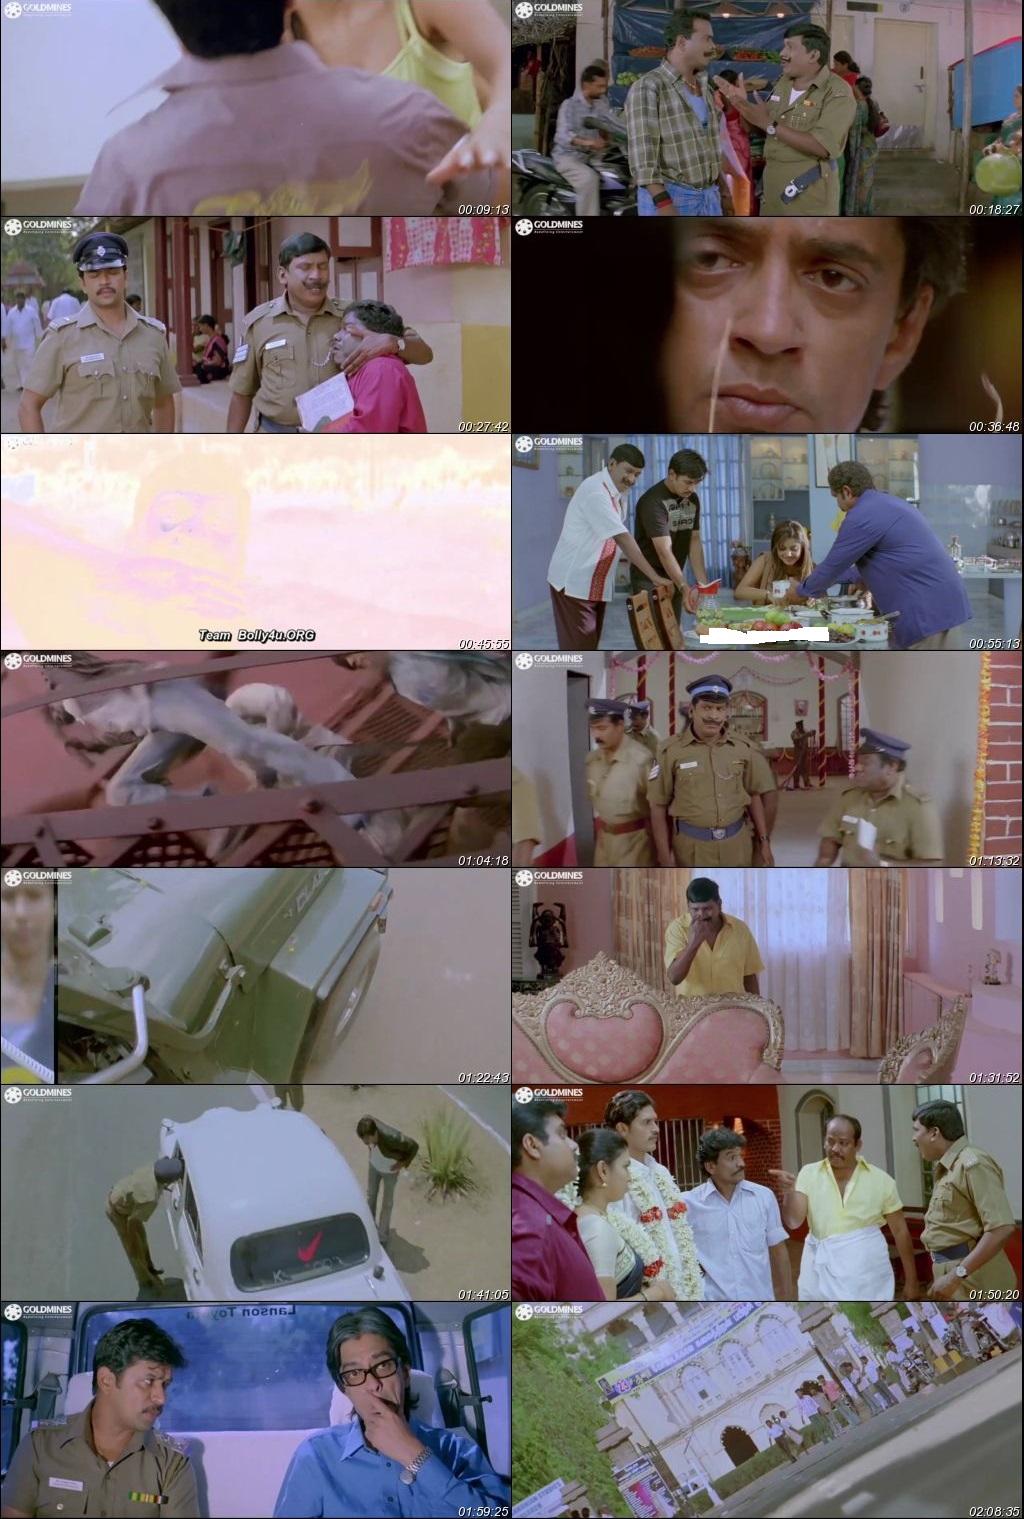 Policewala Gunda 4 (2020) Full Hindi Dubbed Movie Download 480p 720p HDRip Free Watch Online Full Movie Download Worldfree4u 9xmovies